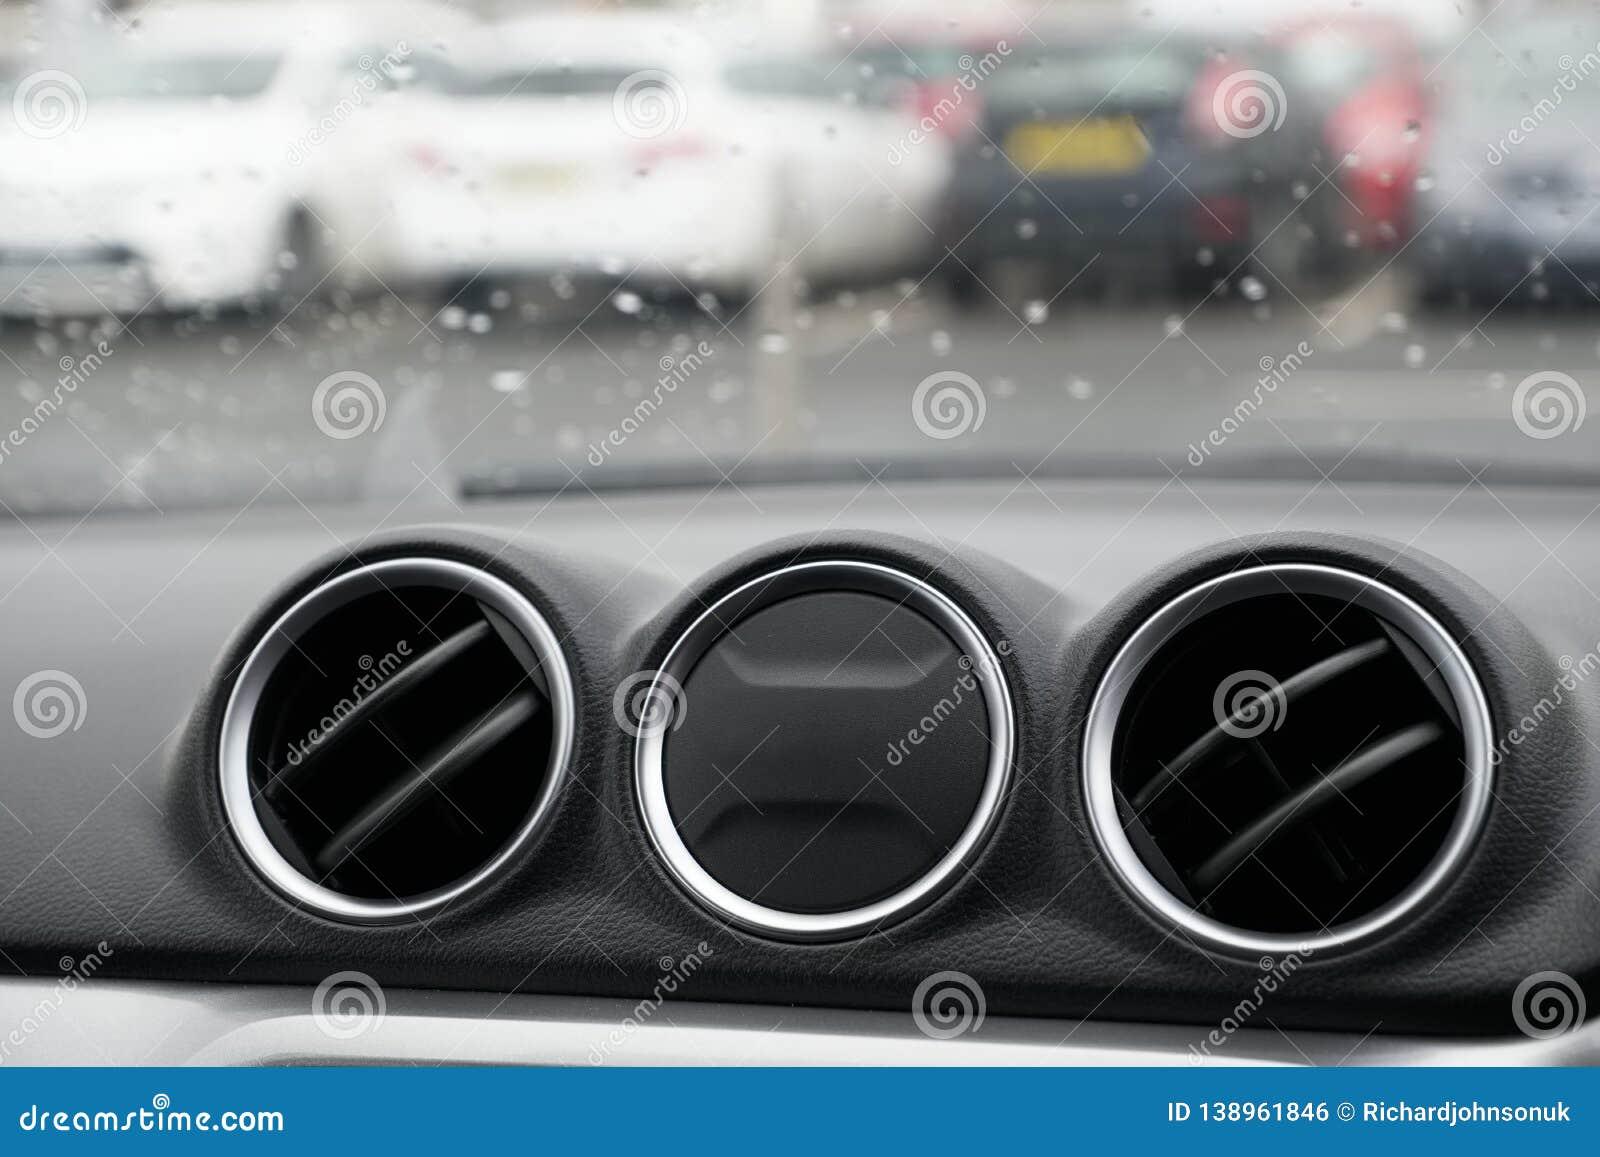 Car interior air vents three circular round on dashboard